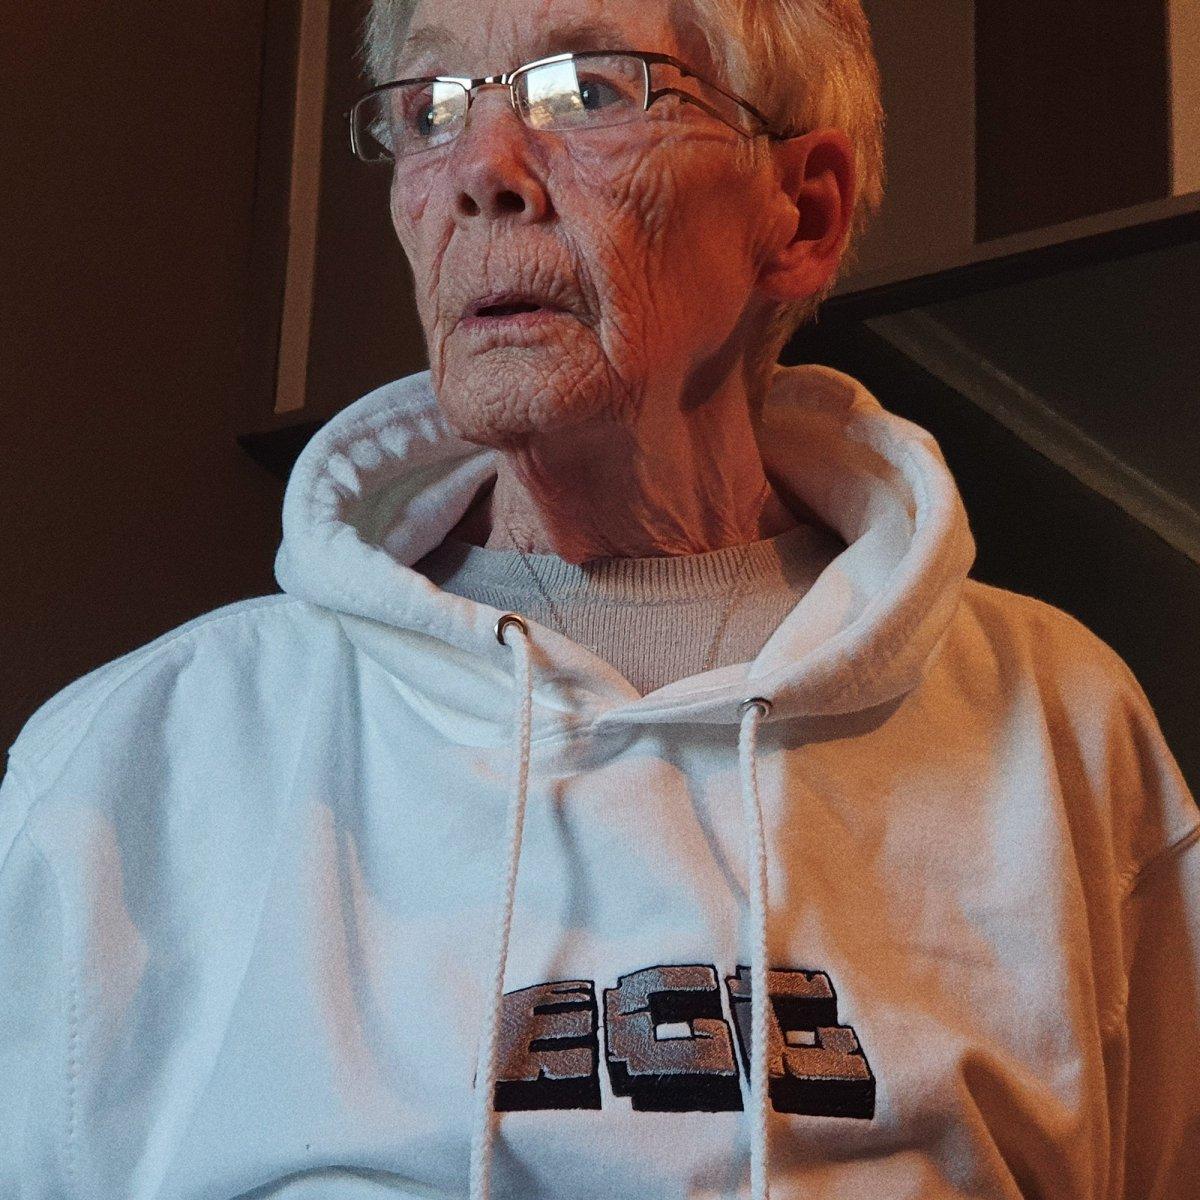 Epic Gamer Grandma - Minecraft EGG White Embroidered Hoodie